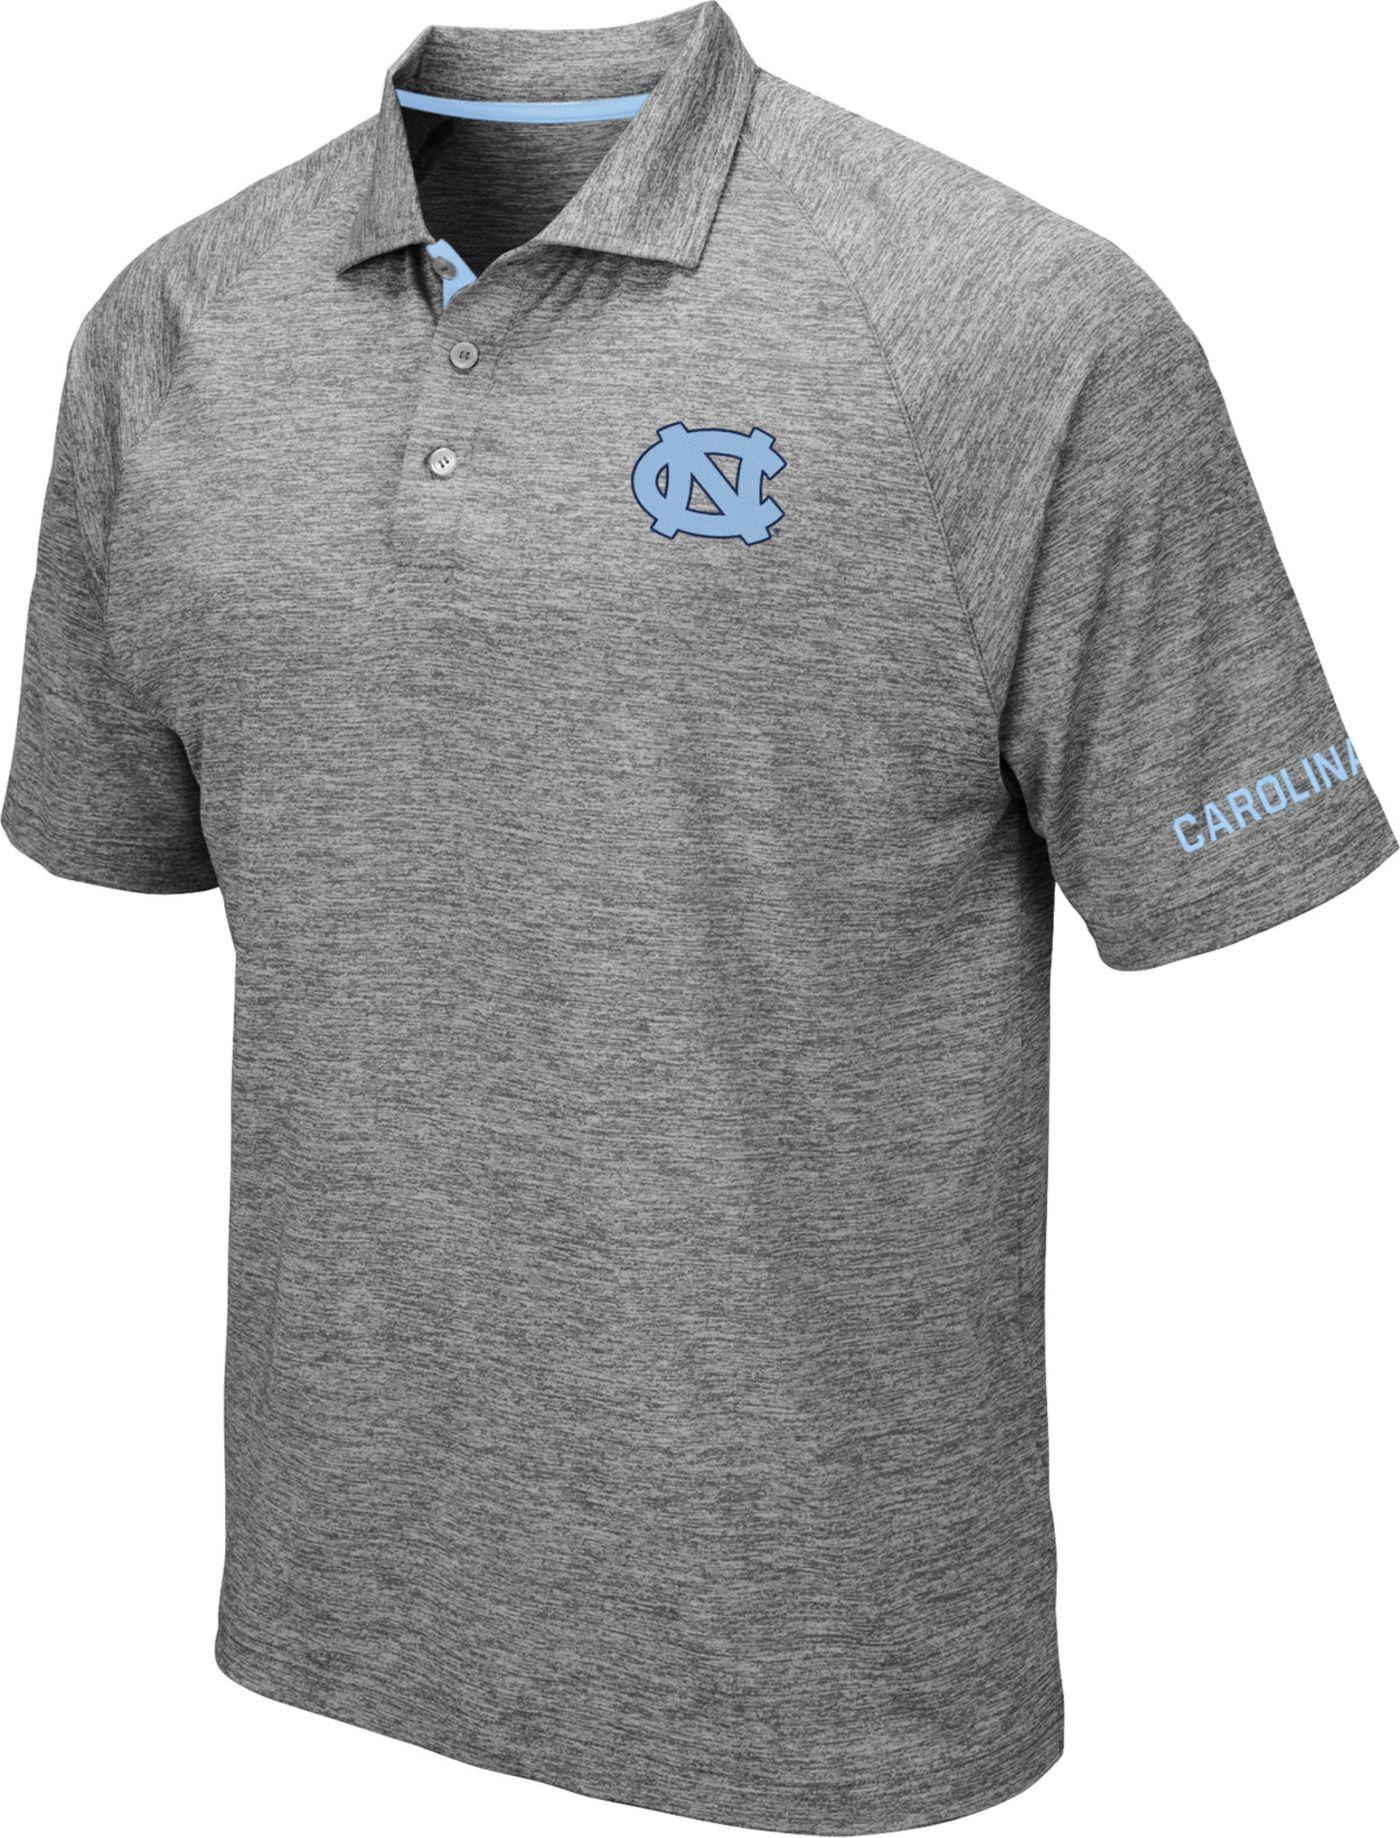 Colosseum Men's North Carolina Tar Heels Grey Chip Shot Polo